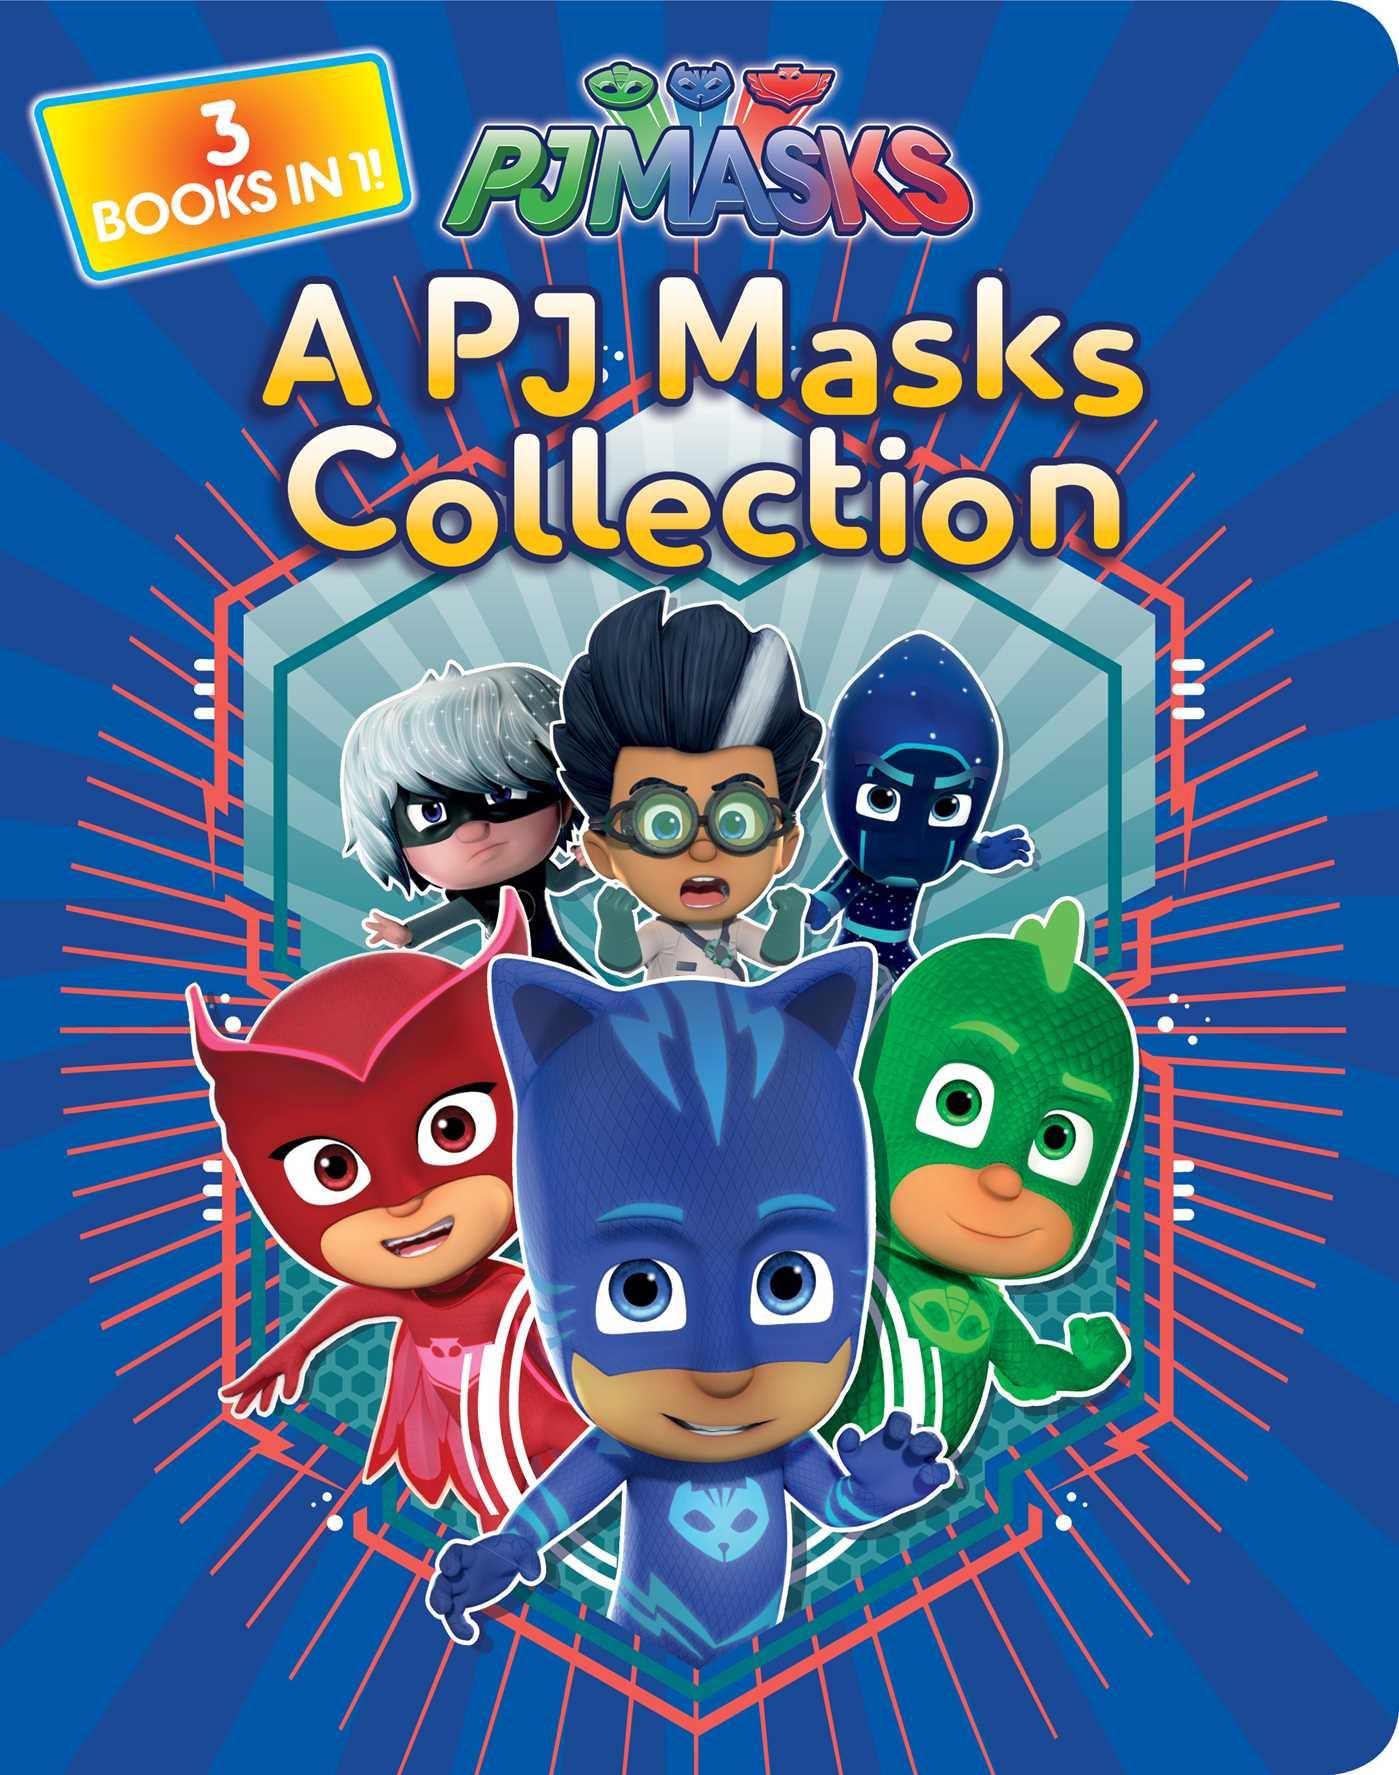 A pj masks collection 9781534433663 hr